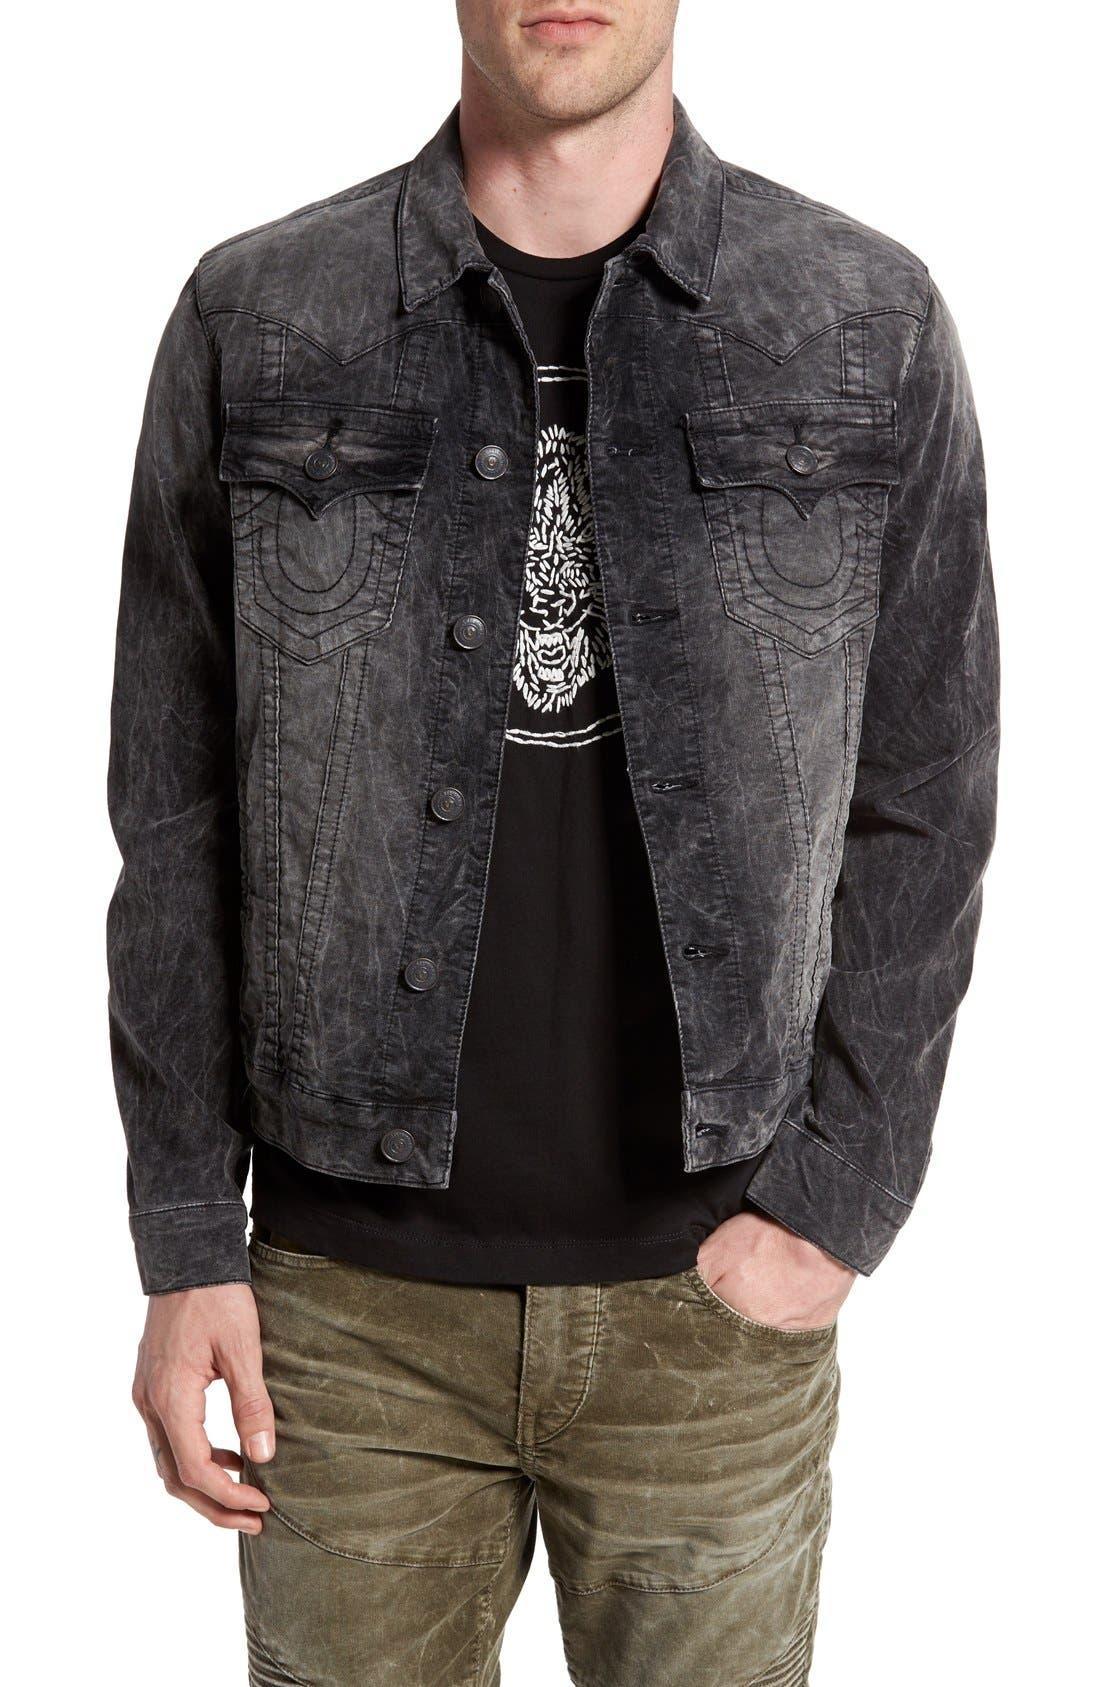 Main Image - True Religion Brand Jeans 'Jimmy' Corduroy Western Jacket